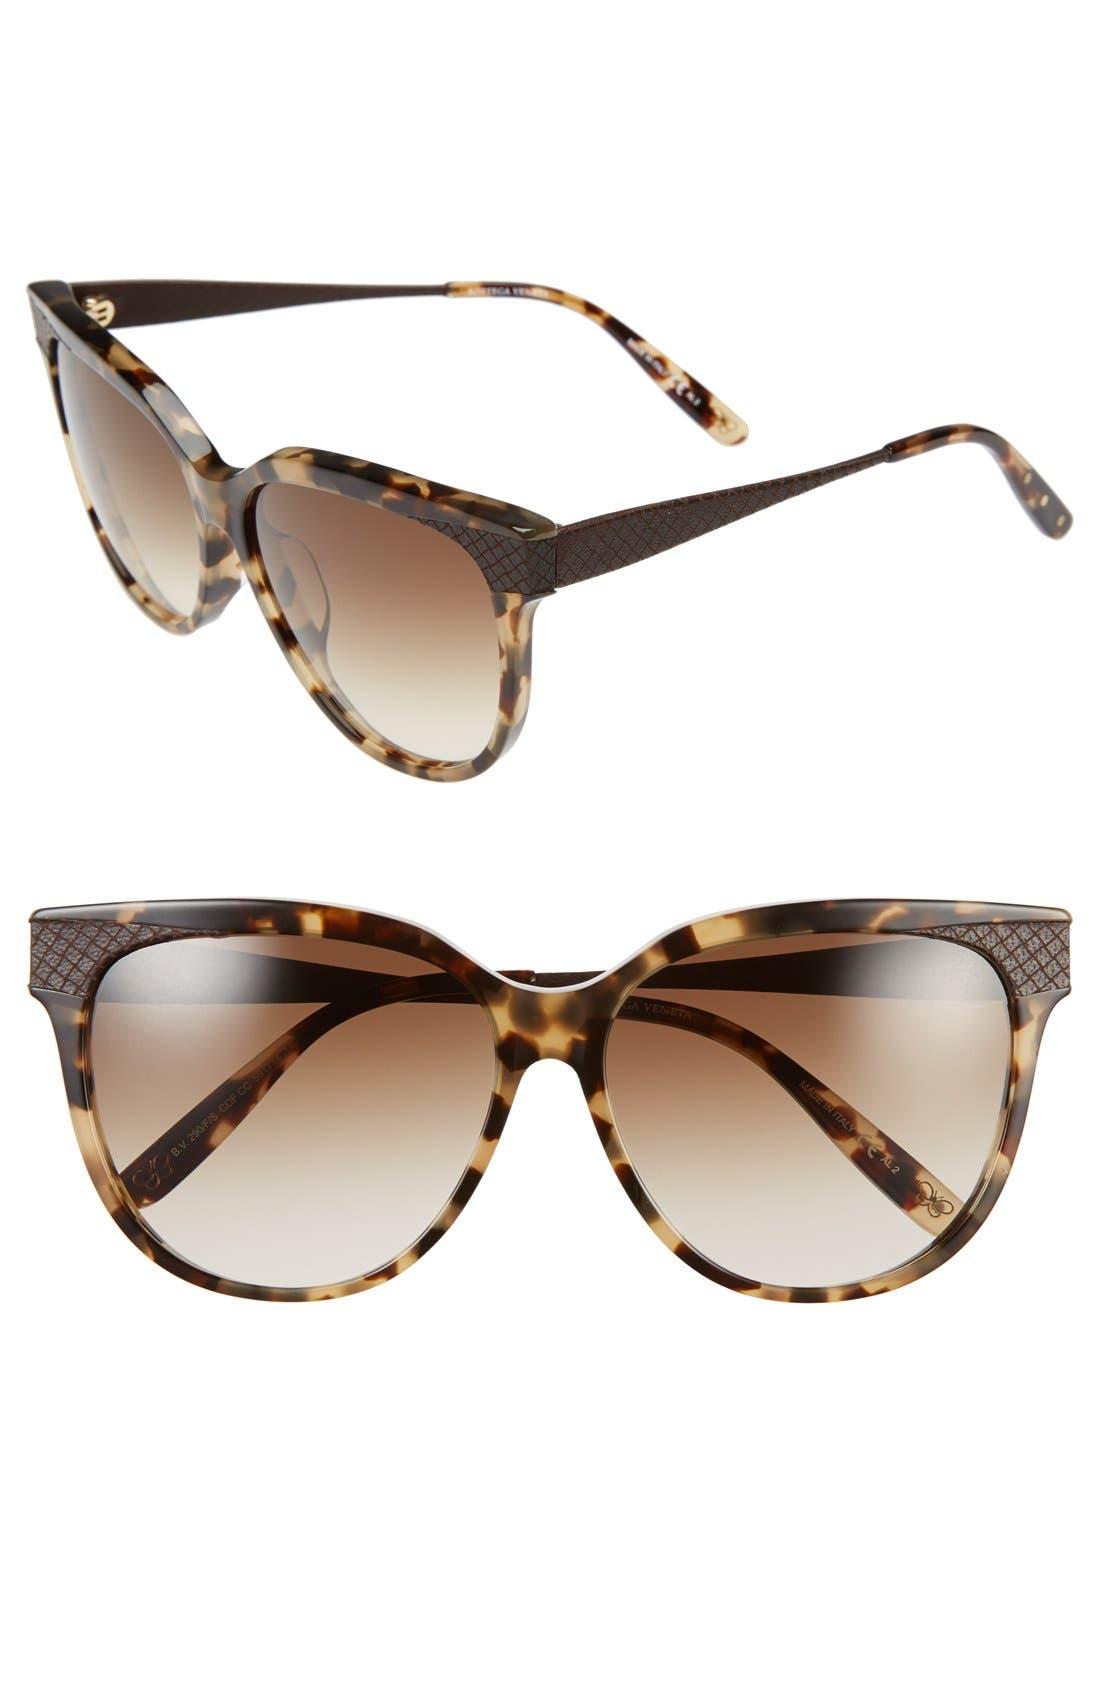 Alternate Image 1 Selected - Bottega Venata 59mm Special Fit Sunglasses